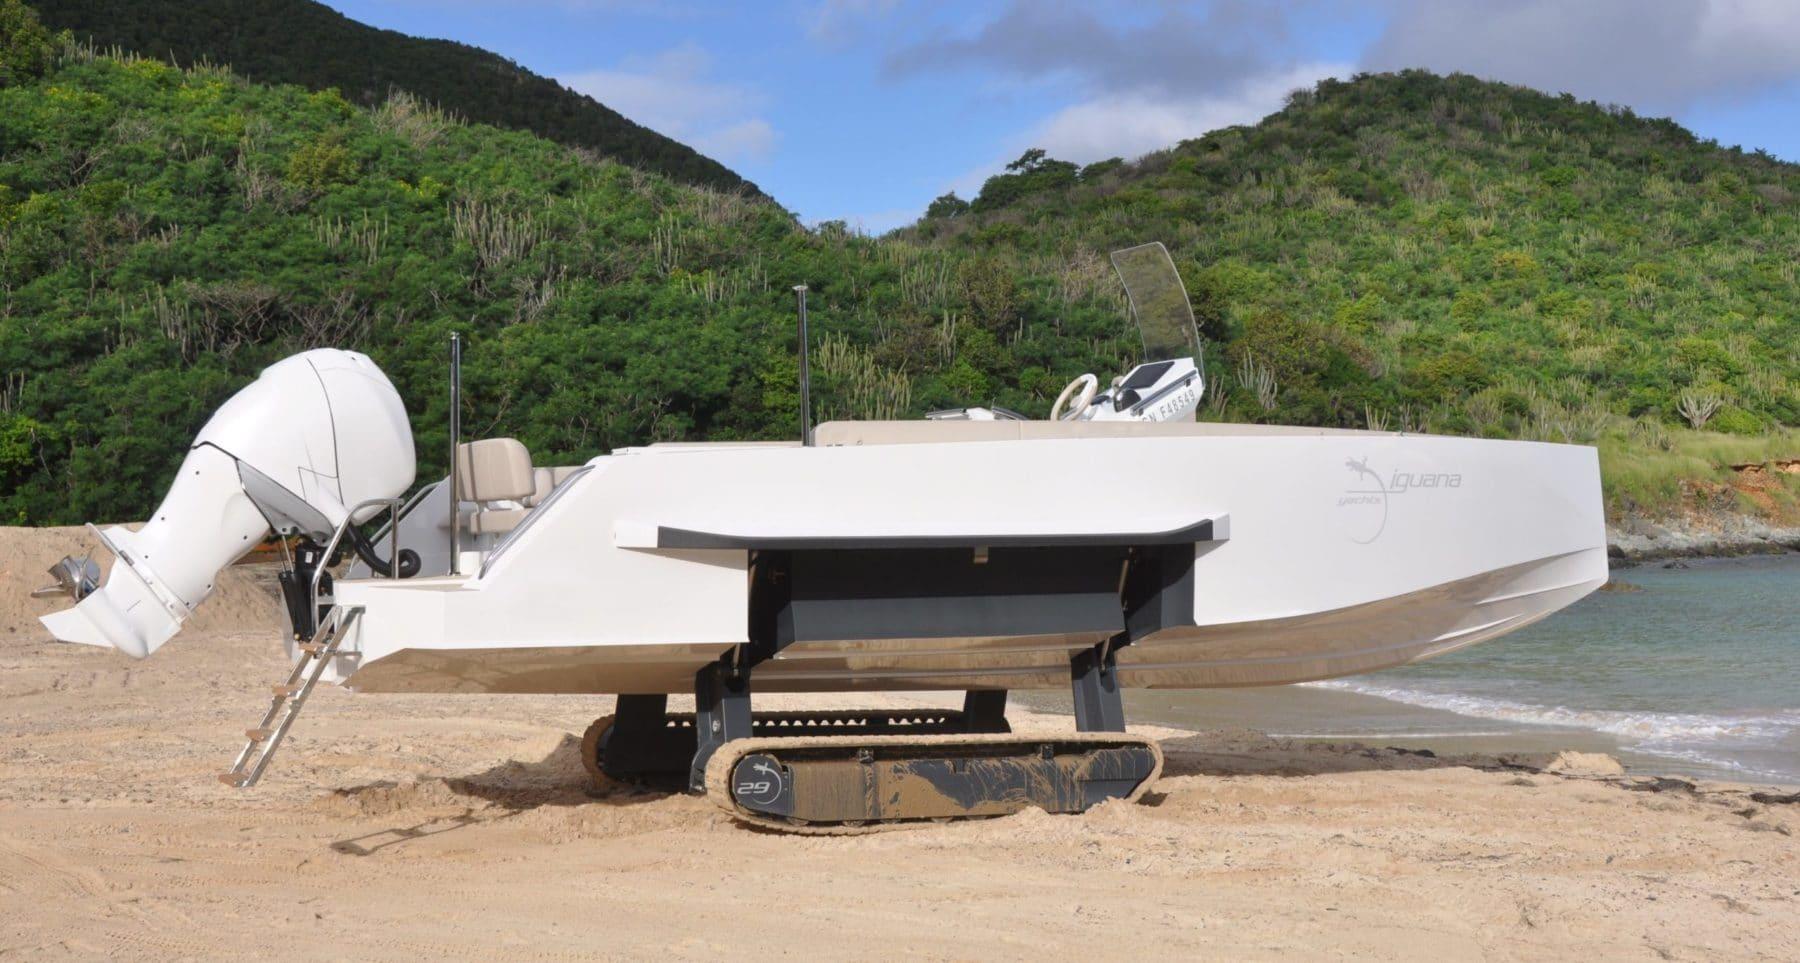 Beach amphibious boat with tracks